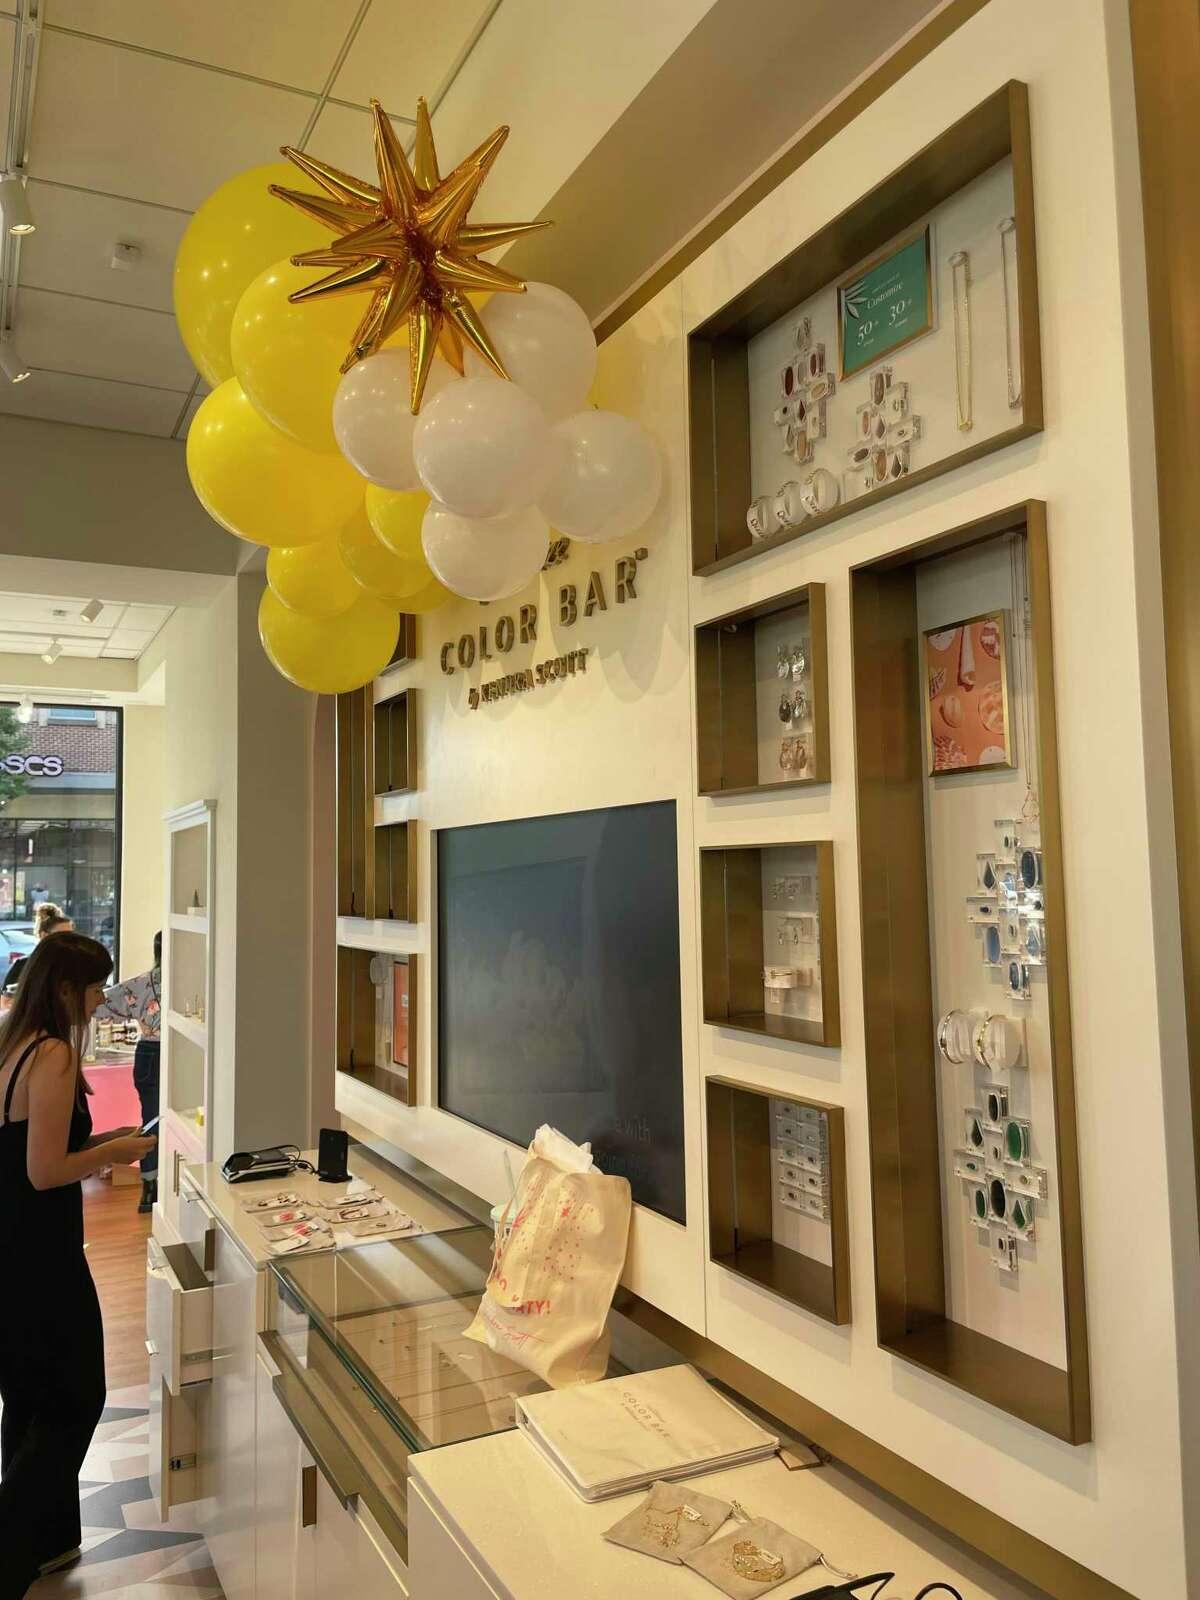 Kendra Scott opened a new permanent Katy location on Friday July 23, 2021